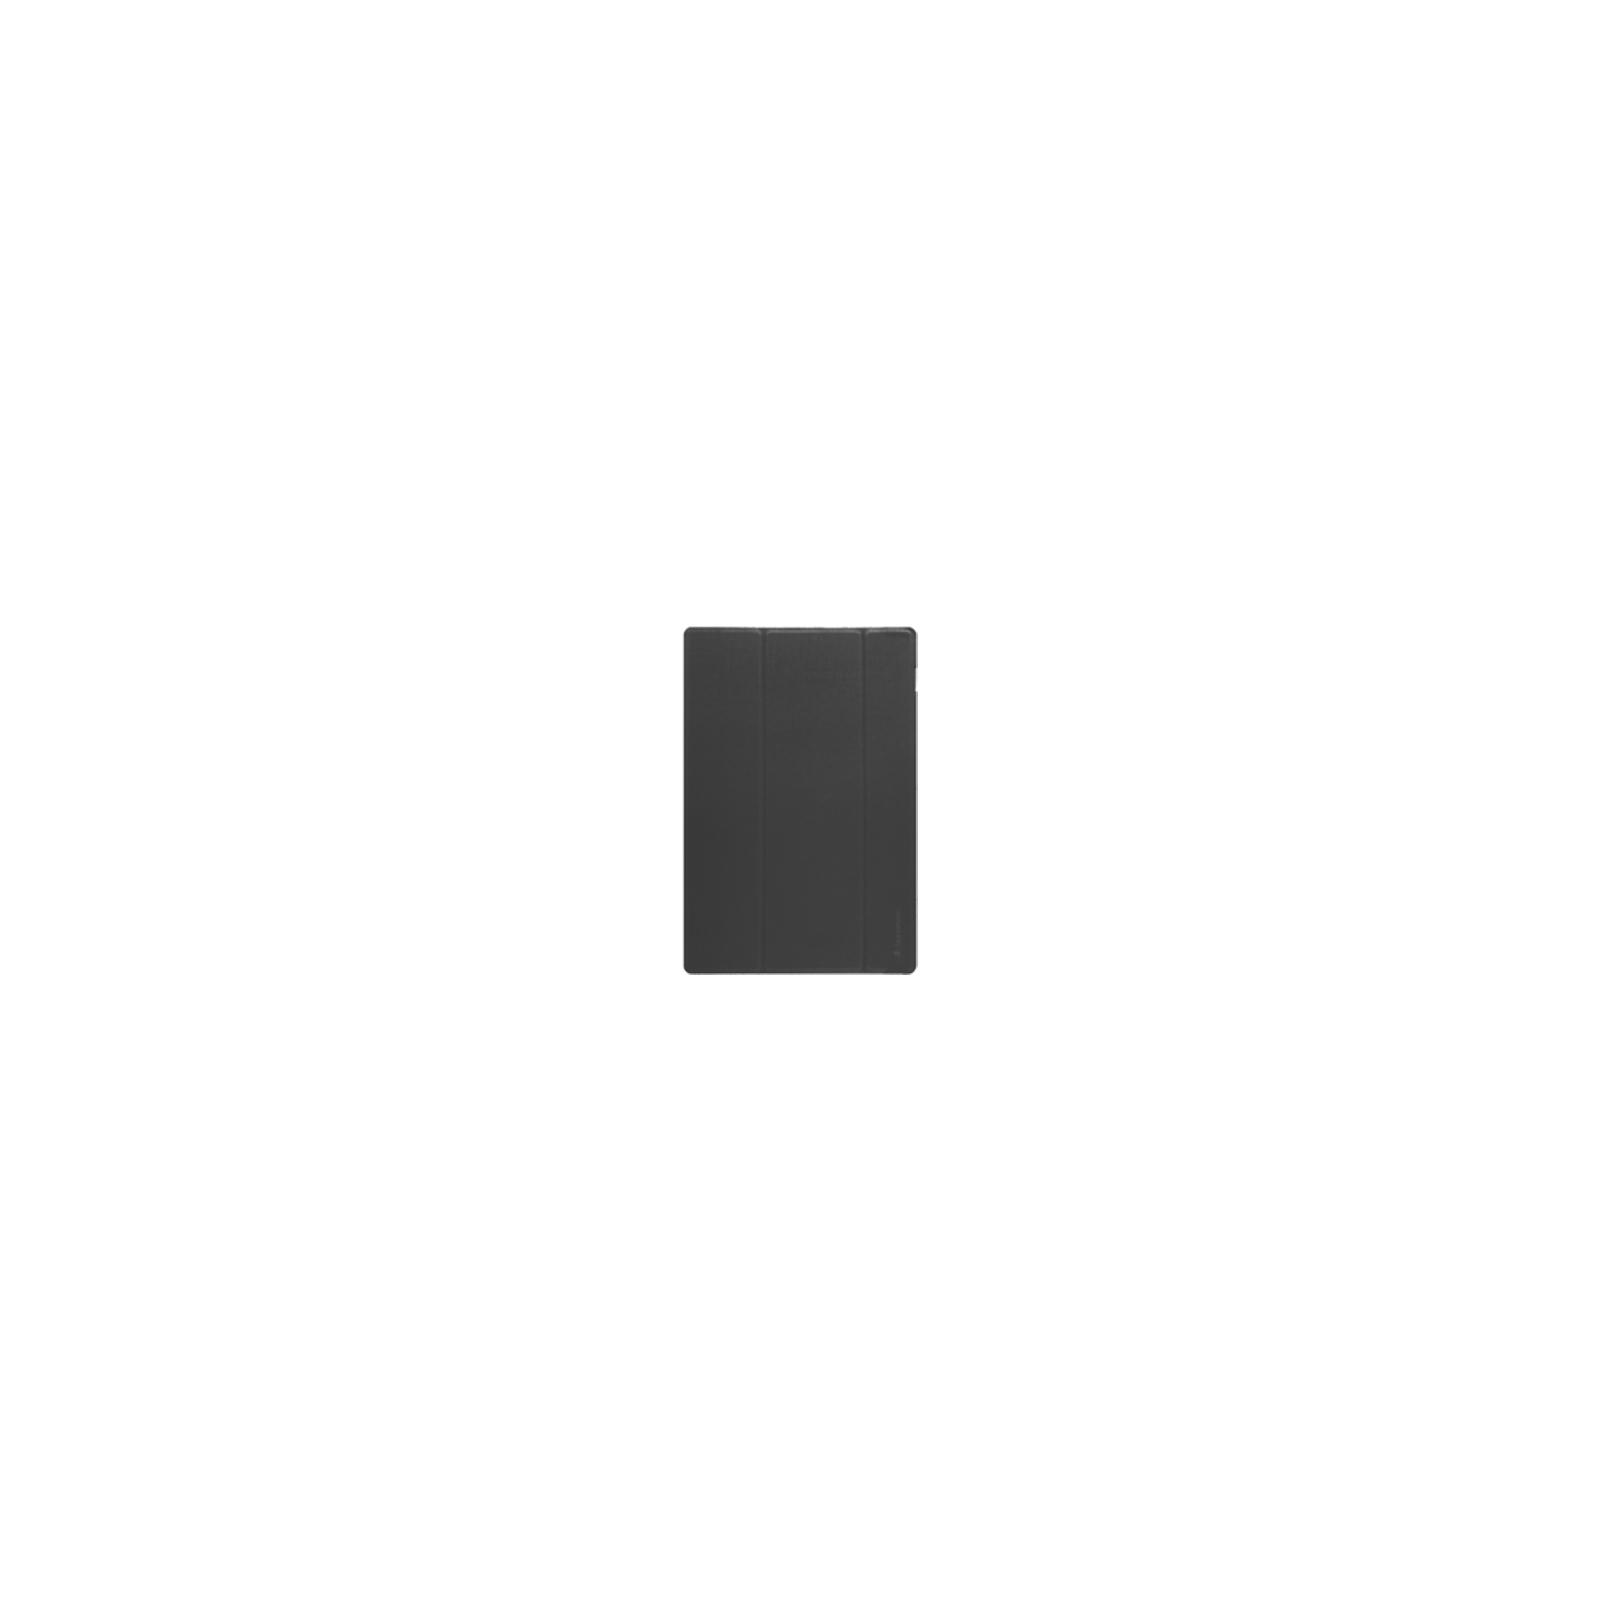 Чехол для планшета Lenovo 10' S6000L Folio Case and Film /Black (888015822)